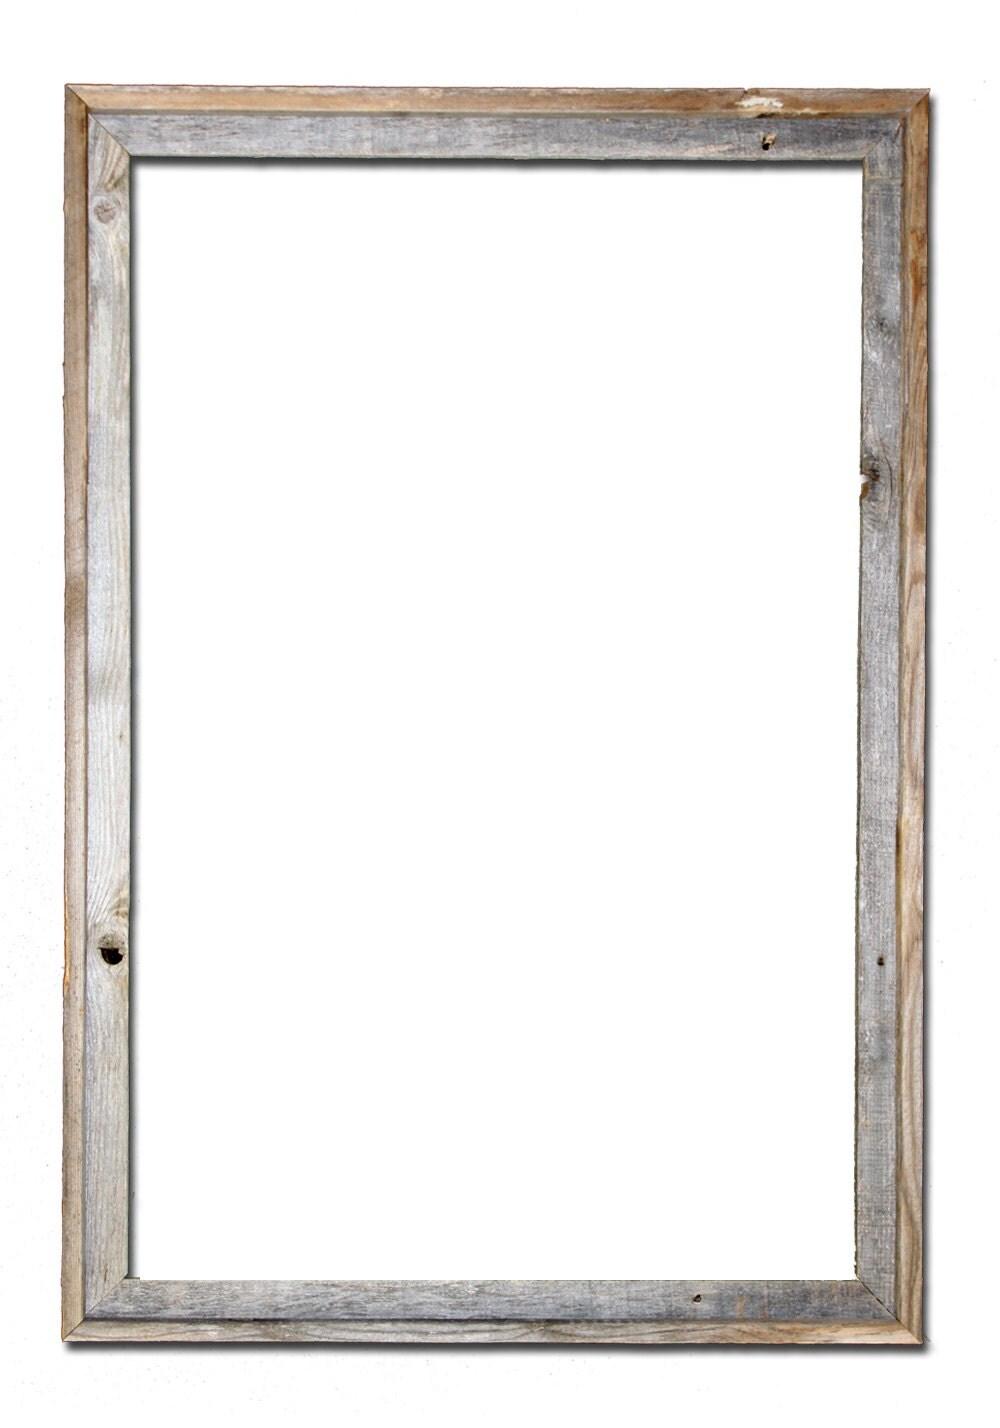 🔎zoom - 24x36 2 Wide Barnwood Reclaimed Wood Open Frame No